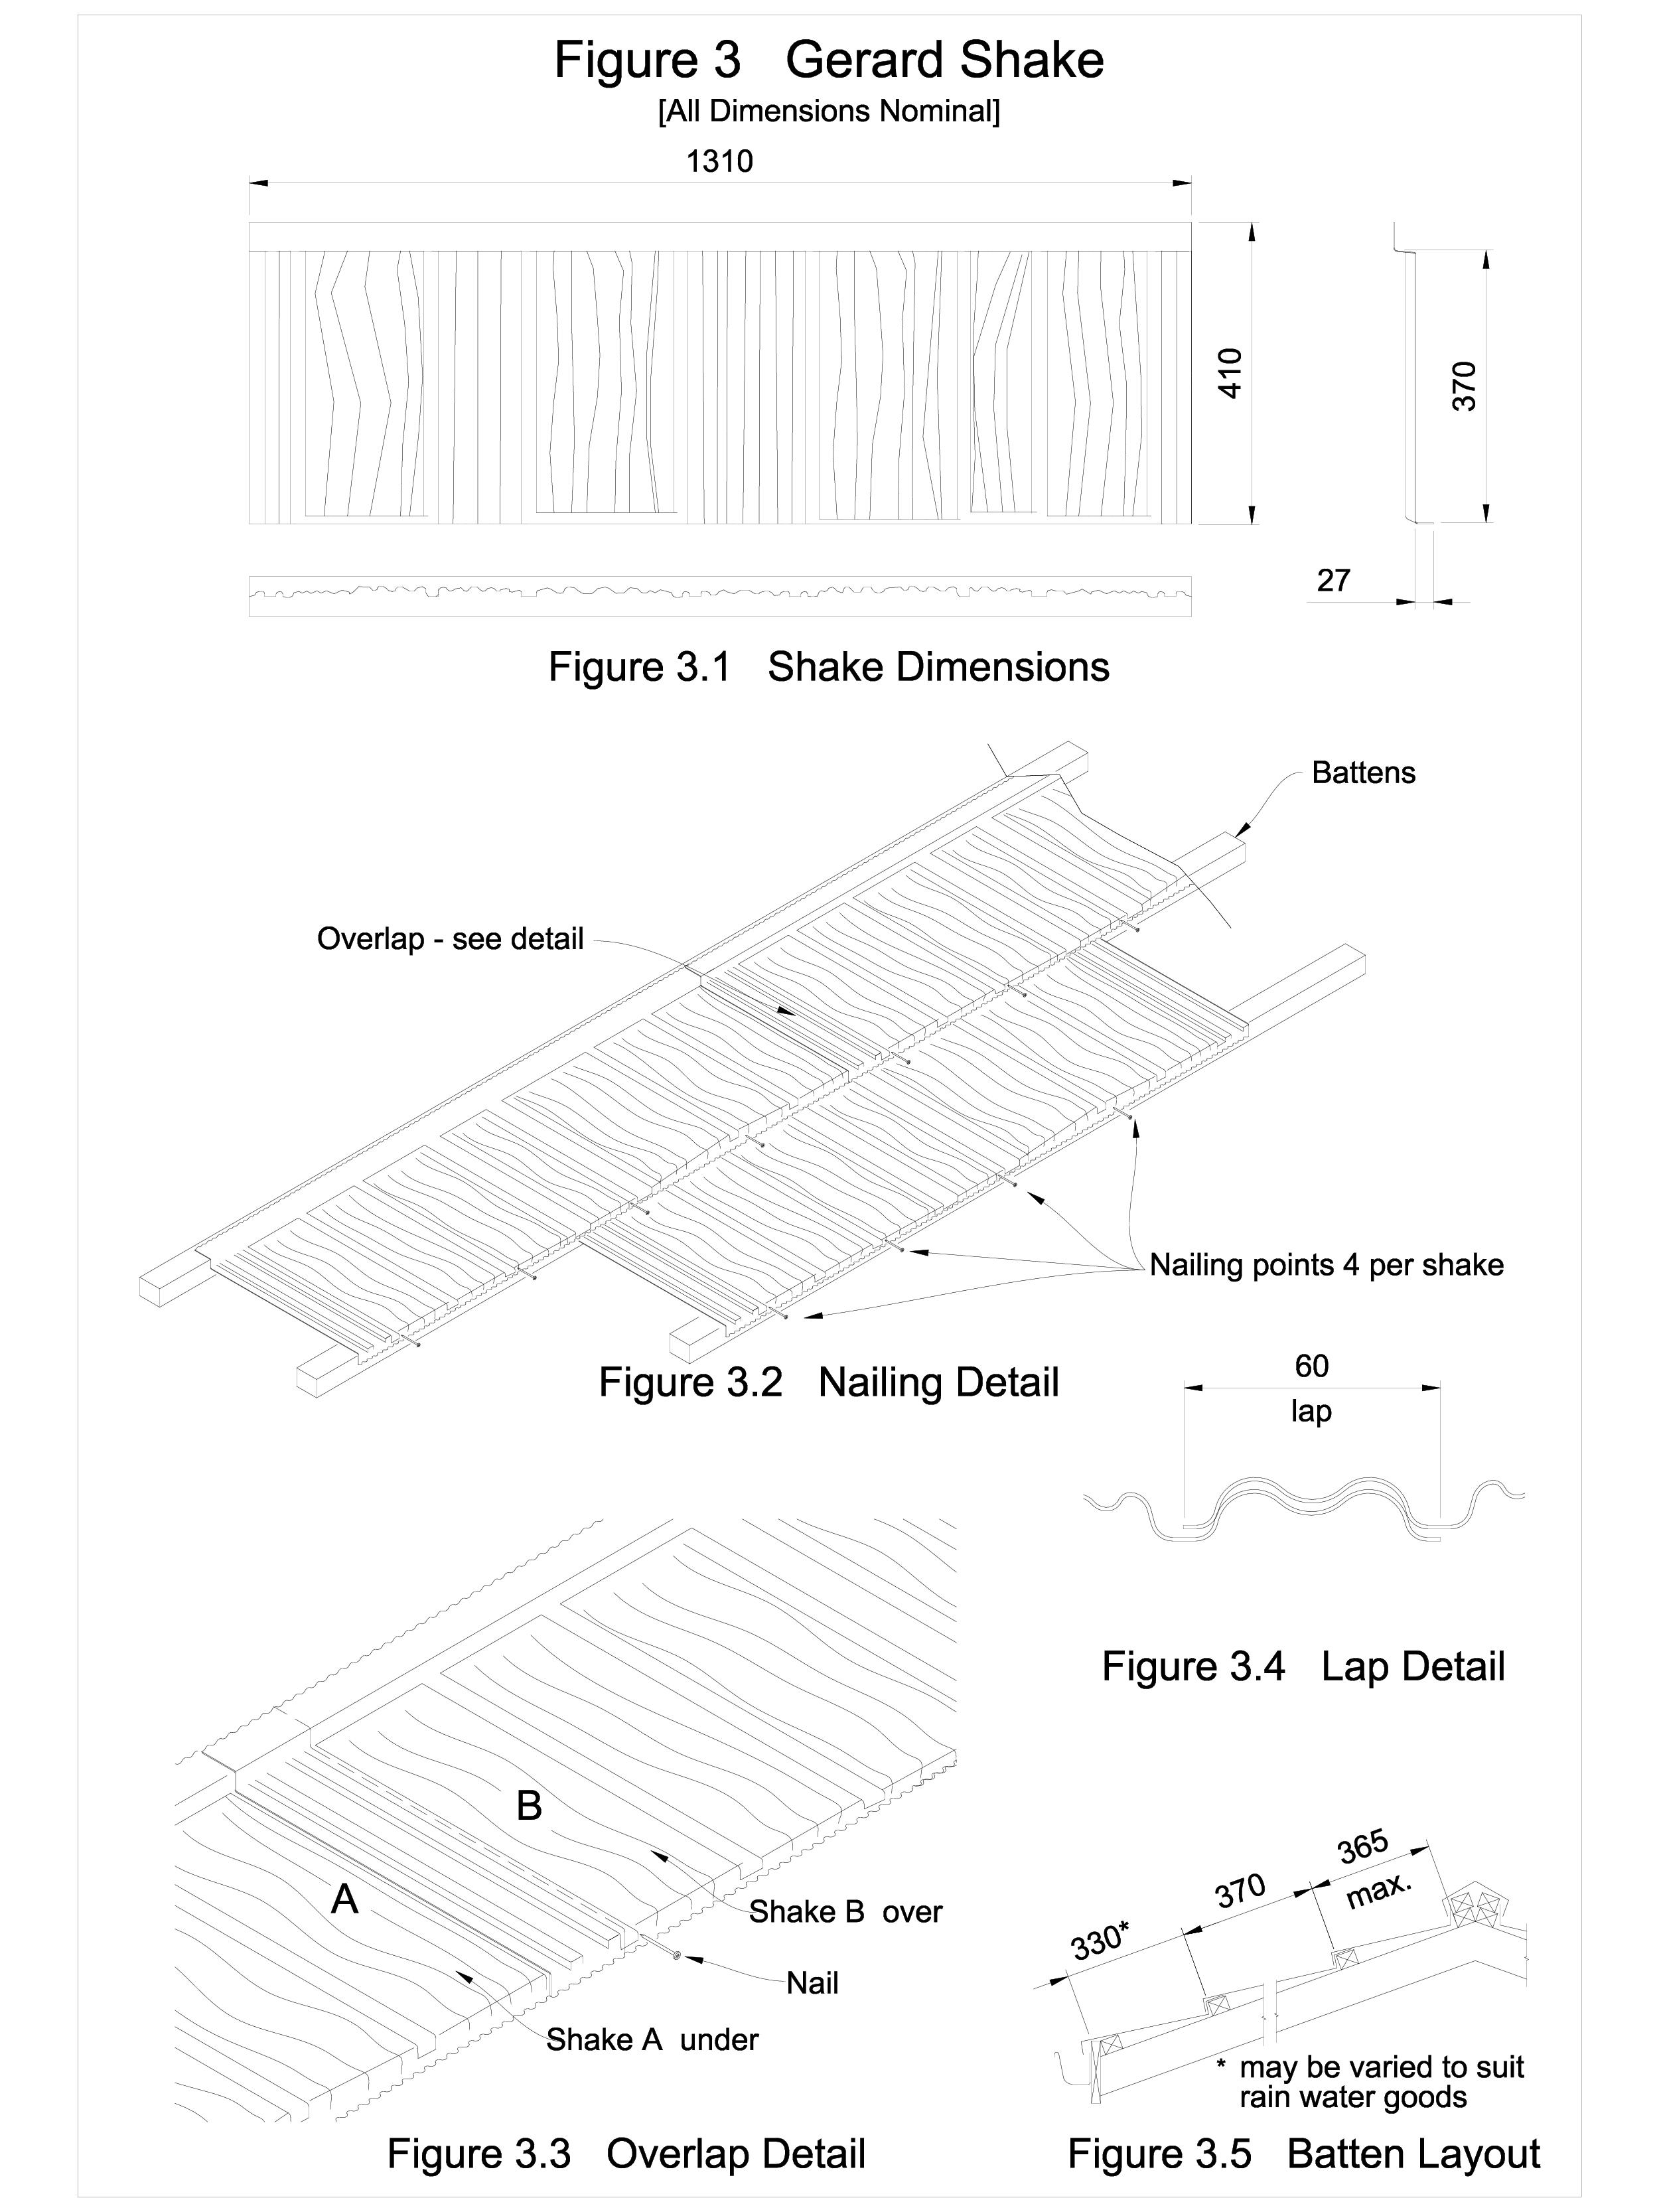 Detaliu de imbinare in camp, invelitori din tabla tip tigla SHAKE GERARD Acoperis cu tigla metalica cu acoperire de piatra naturala FINAL DISTRIBUTION  - Pagina 1